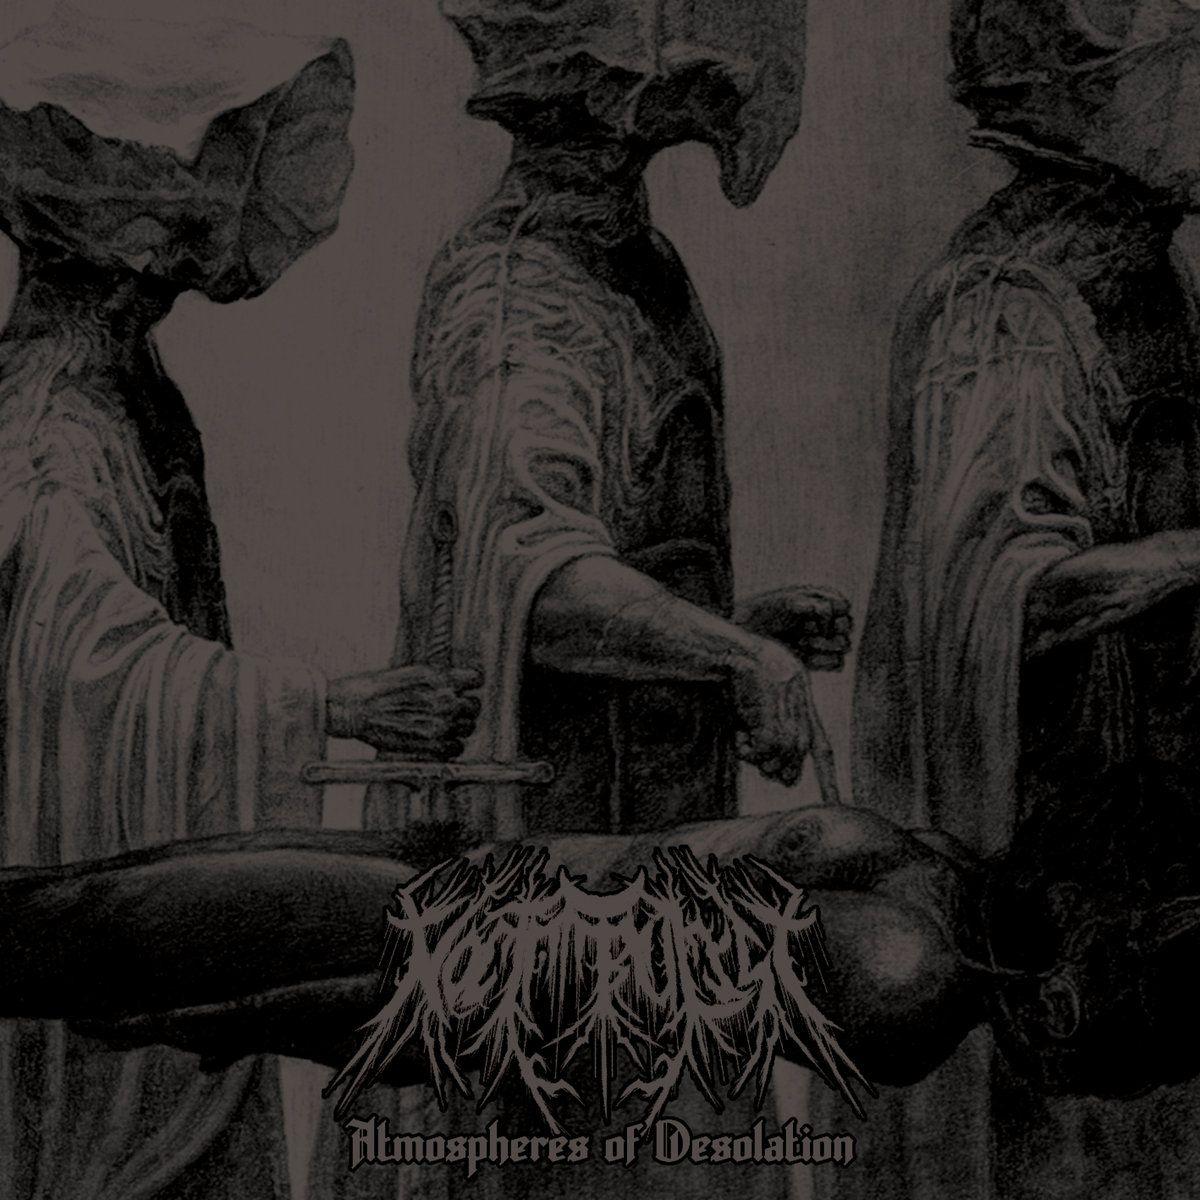 Reviews for Noctambulist - Atmospheres of Desolation